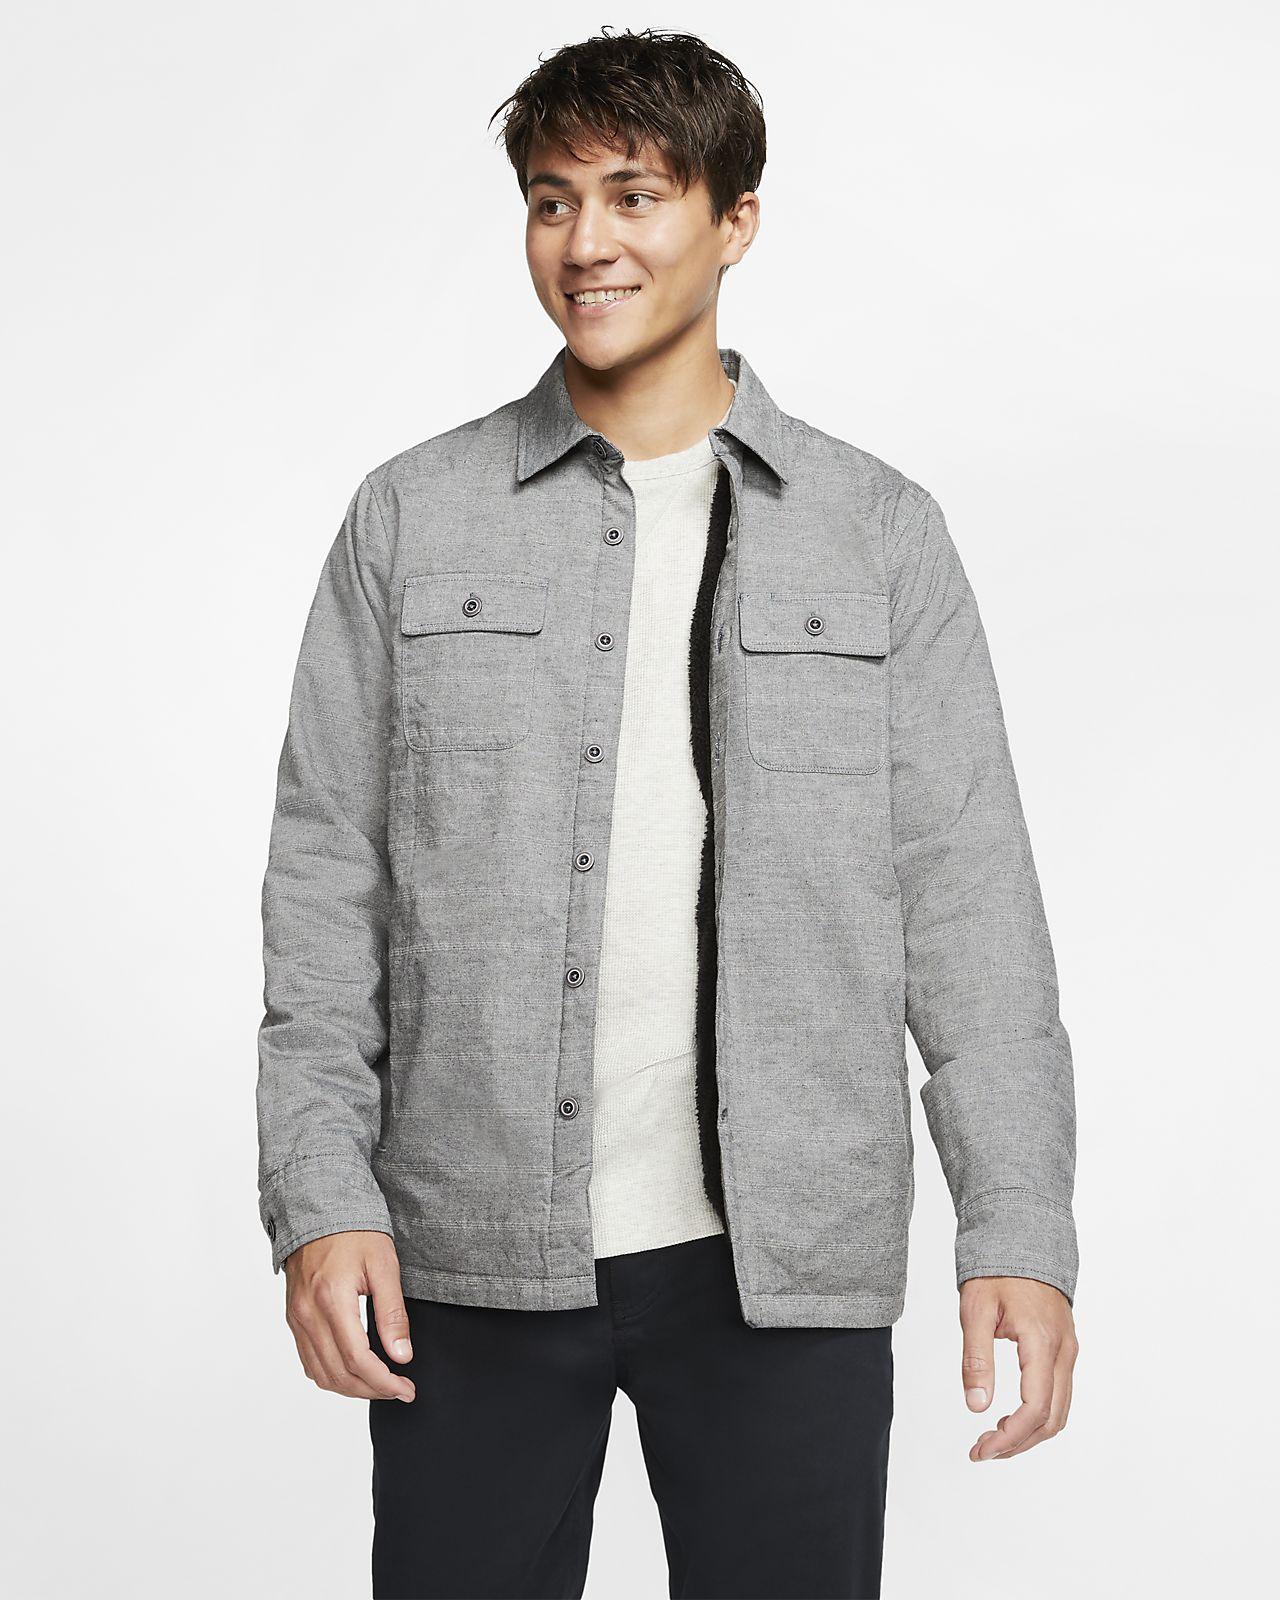 Hurley Cooper Washed Men's Long-Sleeve Shacket